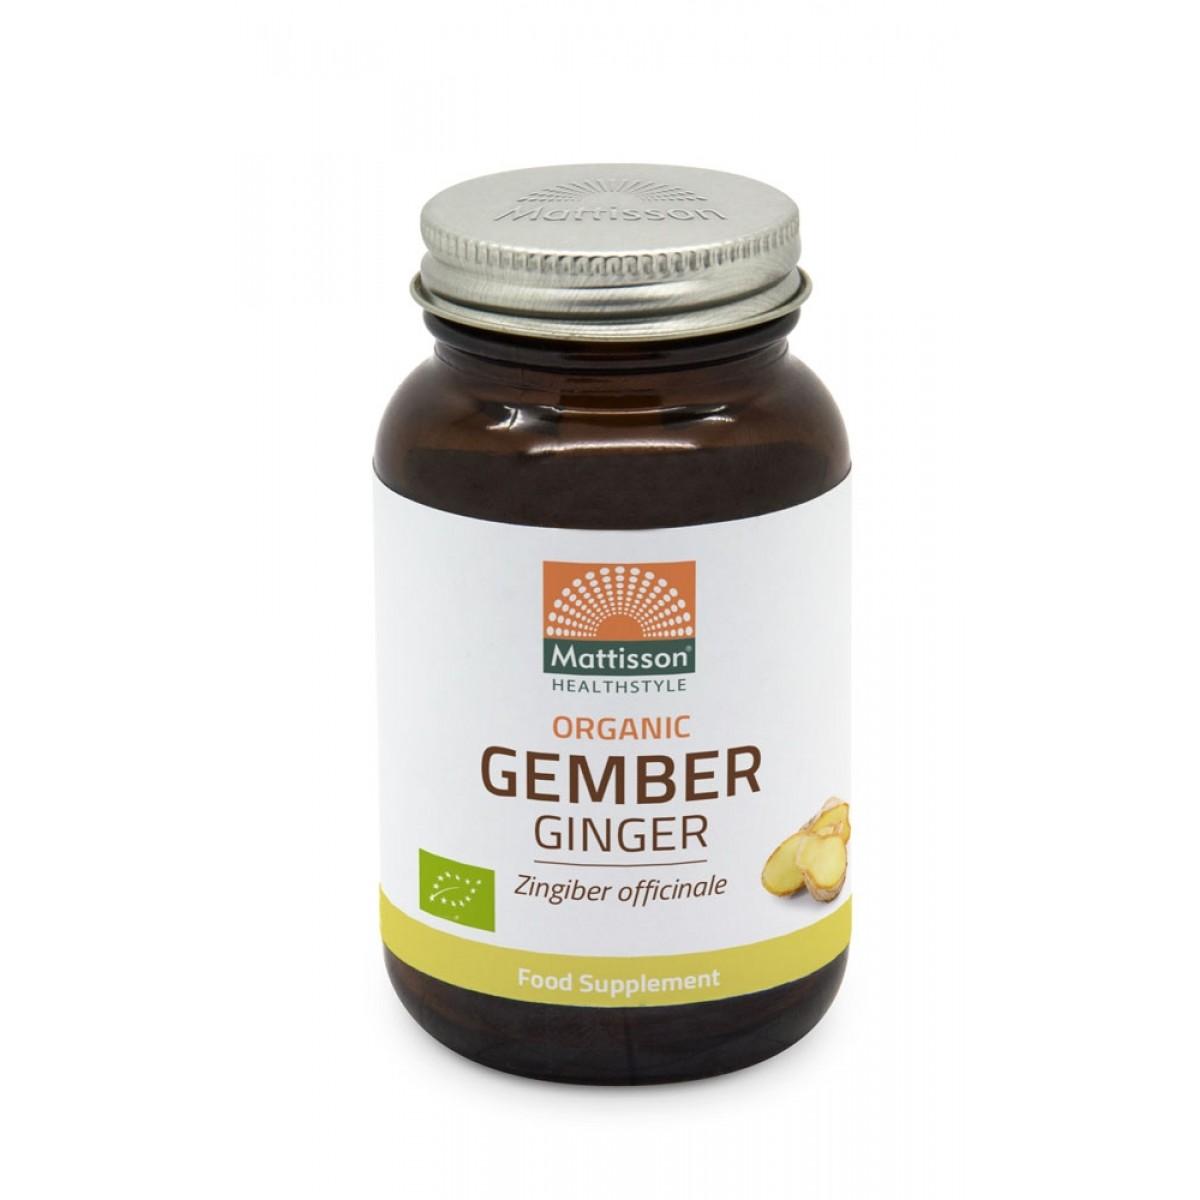 Gember